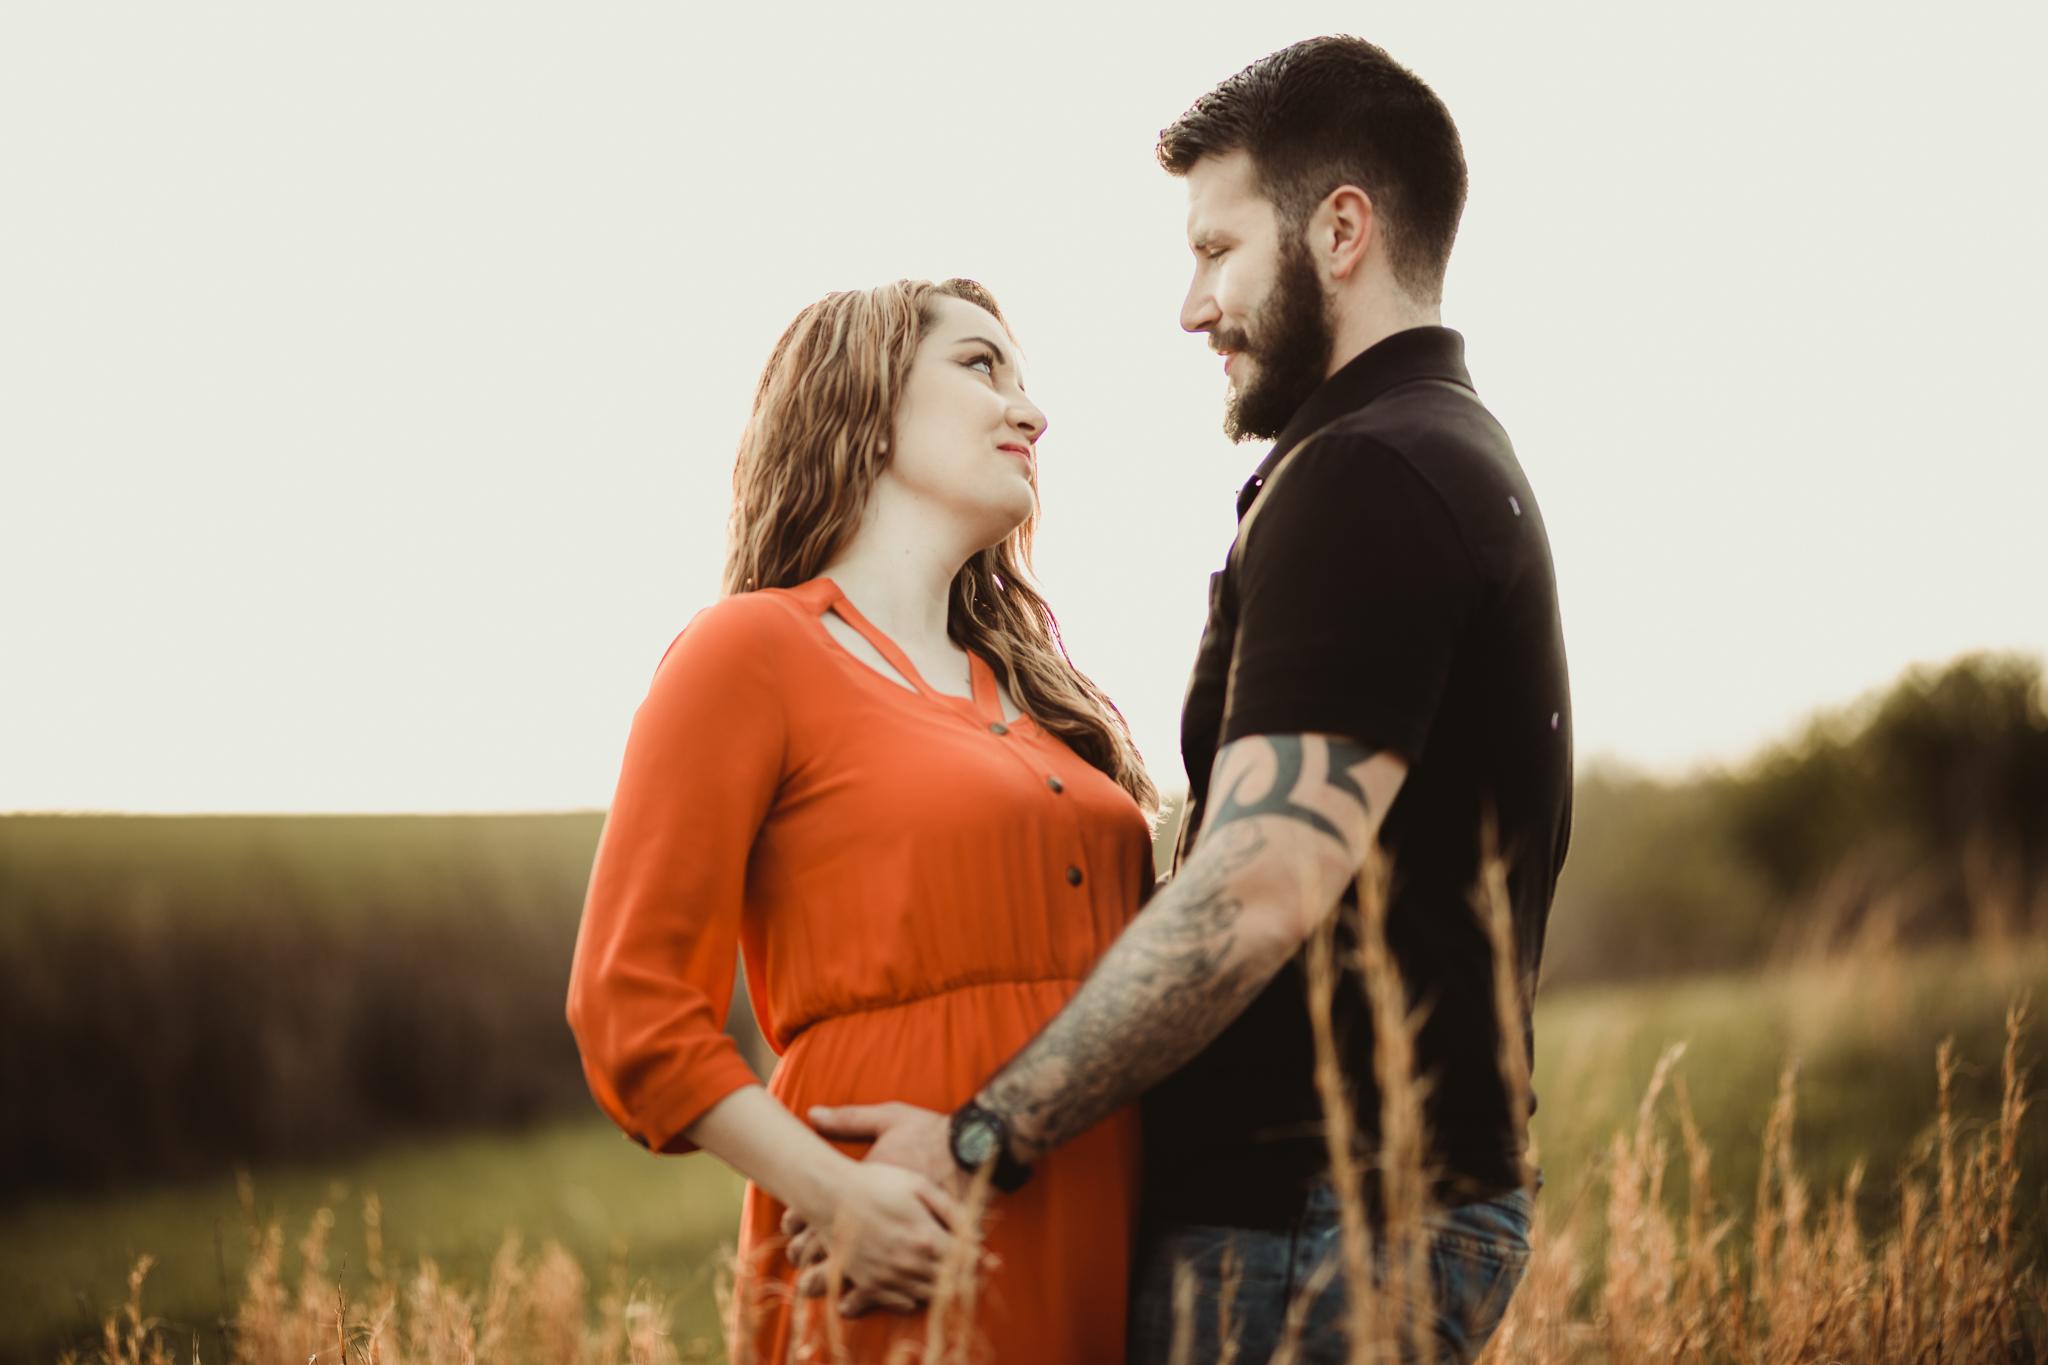 Richmond Kentucky Engagement Photographer - Ariana Jordan Photography -47.jpg